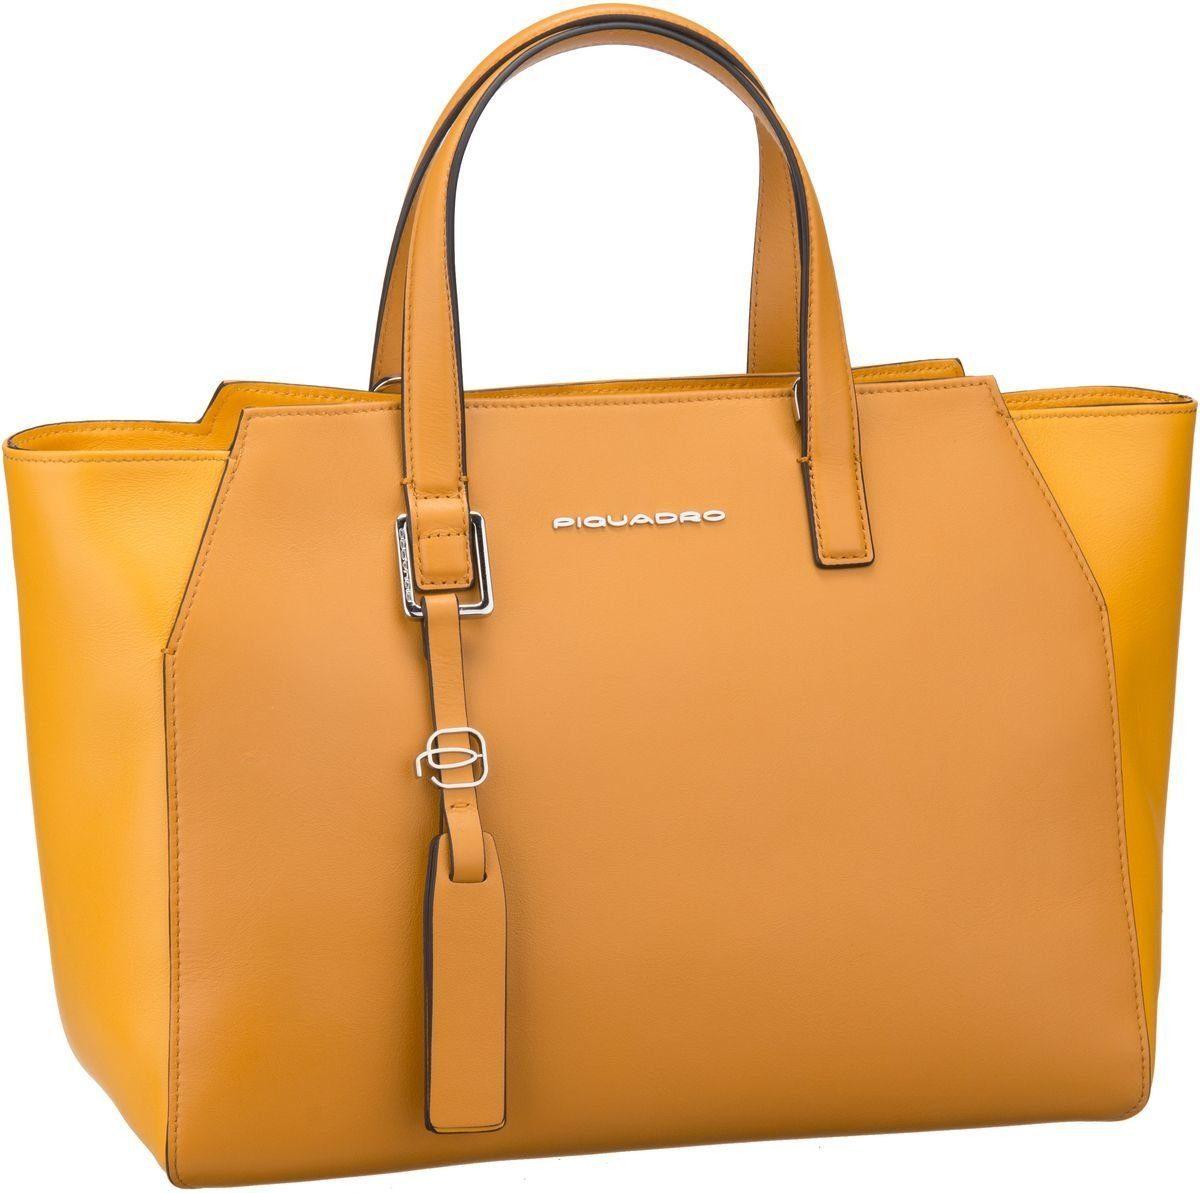 Piquadro Handtasche »Muse Special 4326«